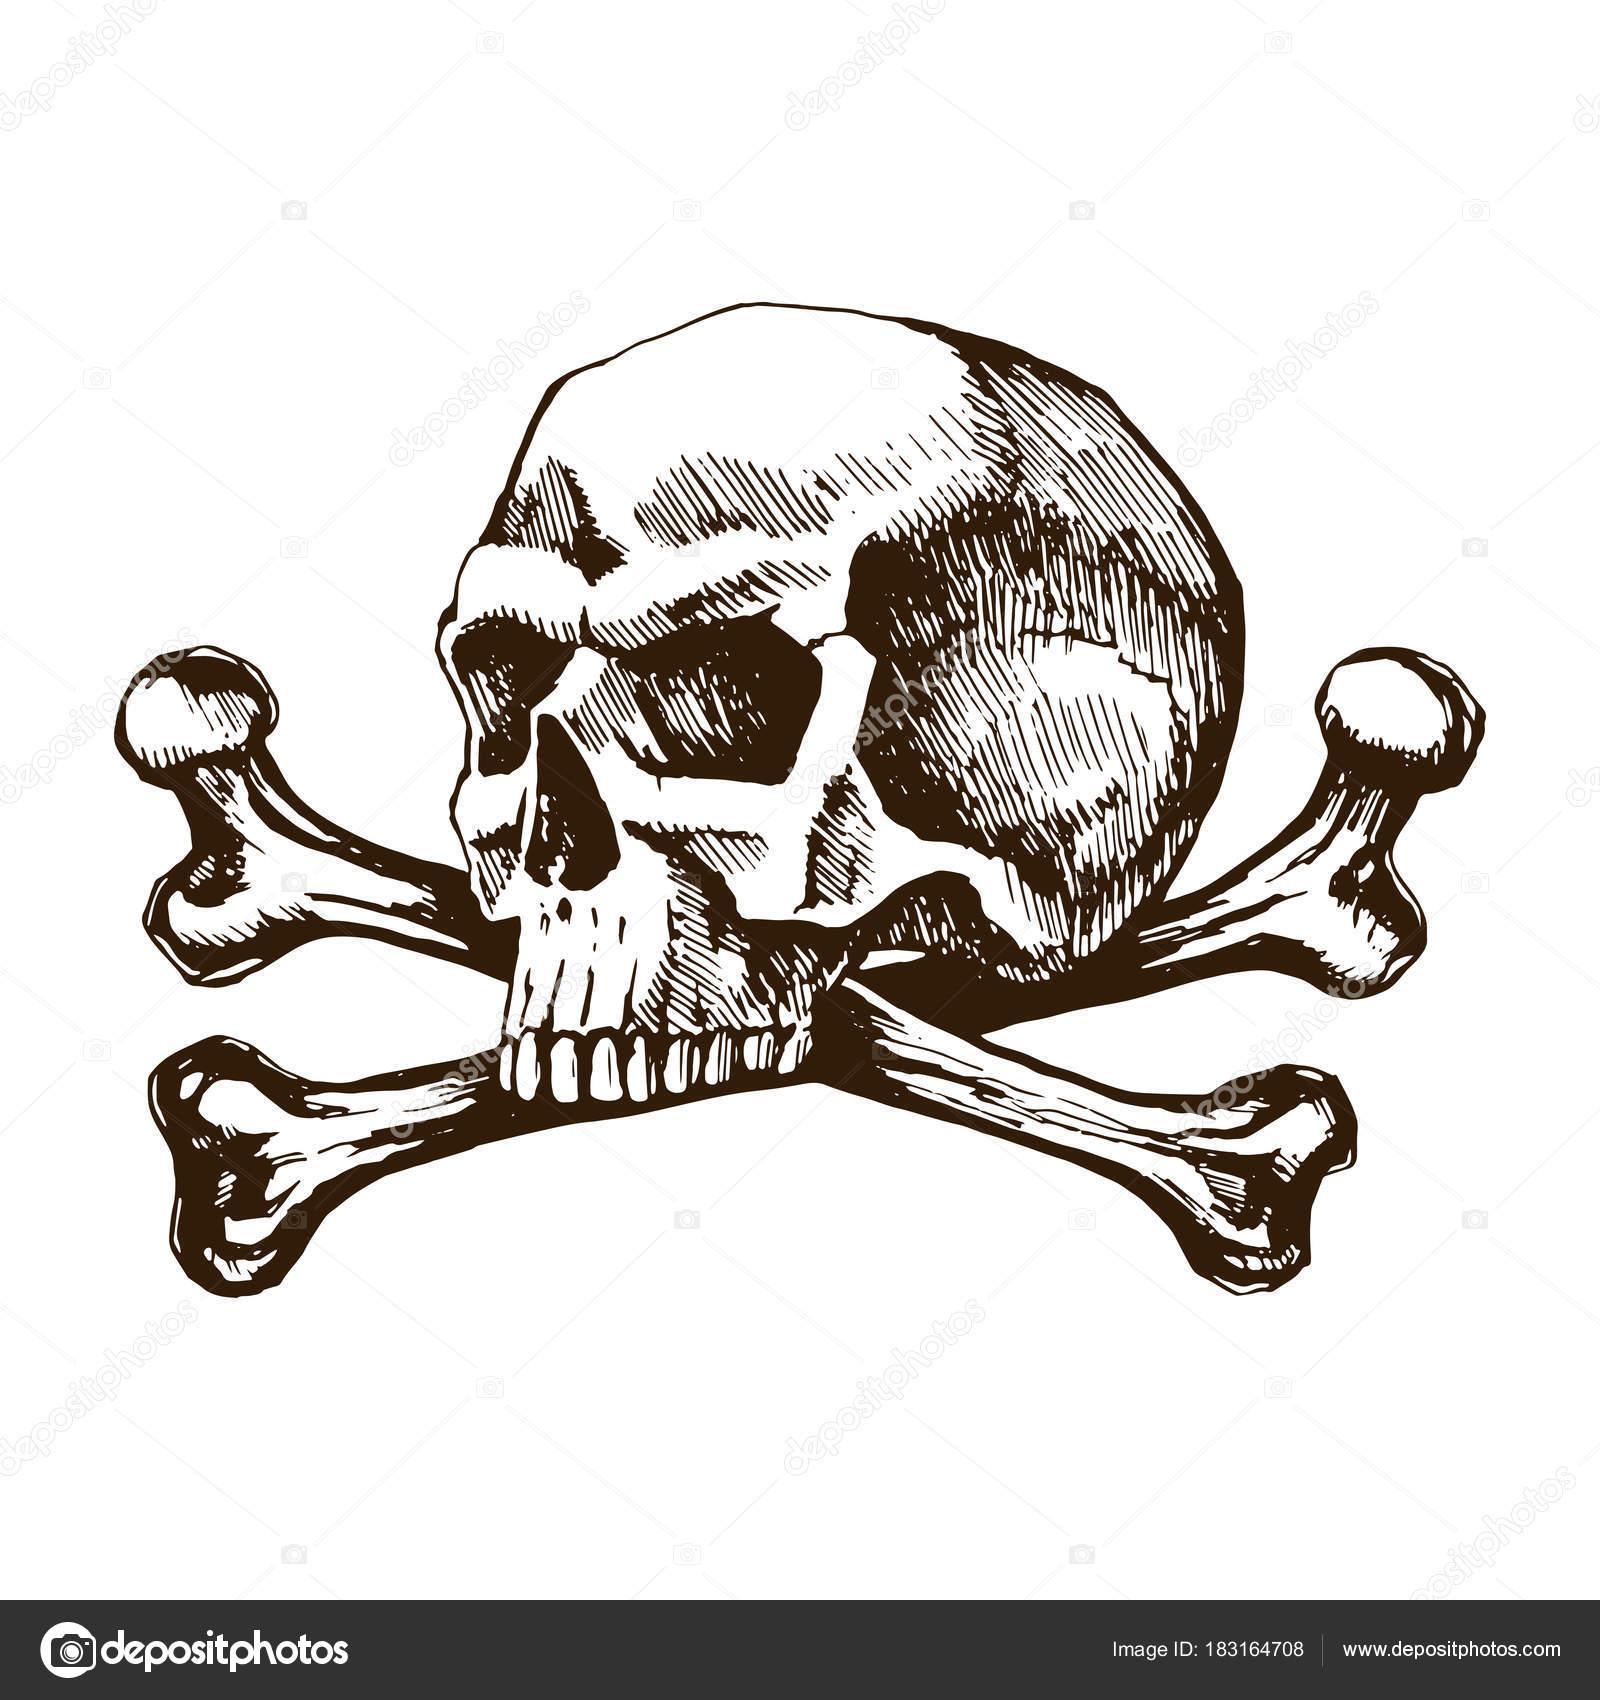 Skull And Crossbones Stock Vector Roma79 0979mail 183164708